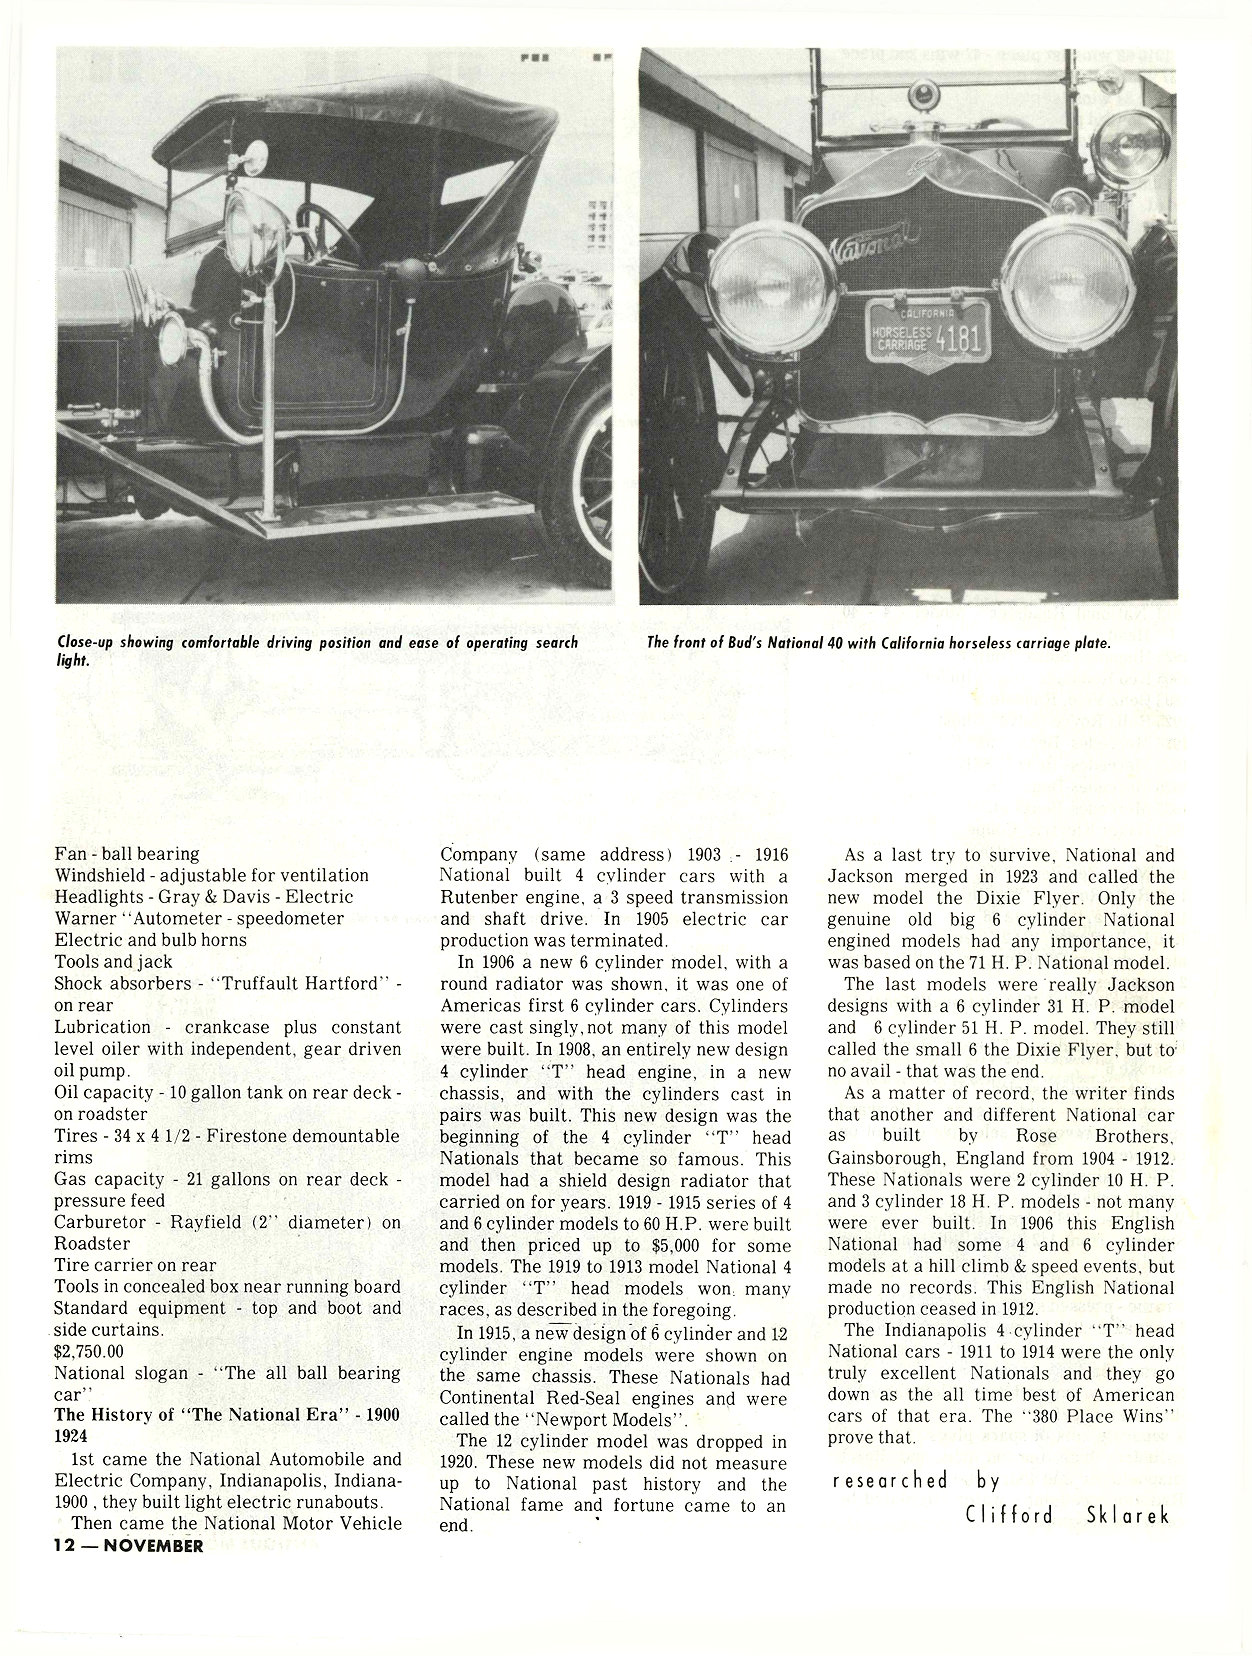 "1913 NATIONAL M. L. ""Bud"" Cohn, owner THE RESTORER Researched by Clifford Sklarek ANTIQUE MOTOR NEWS & Atlantic Auto Advertiser November 1972 8.25″x10.25 page 12"